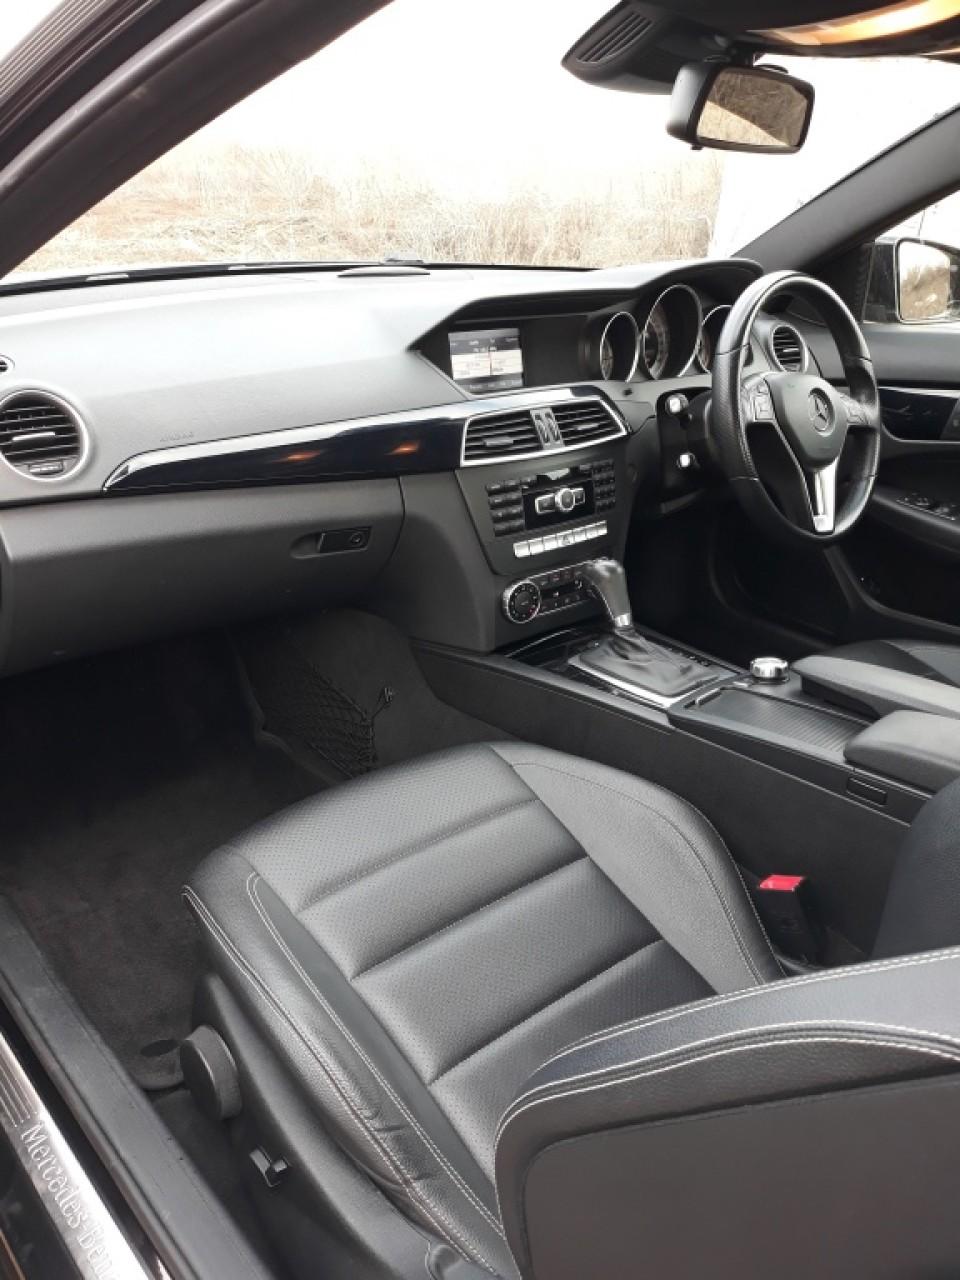 Rampa injectoare Mercedes C-CLASS W204 2013 coupe 2.2